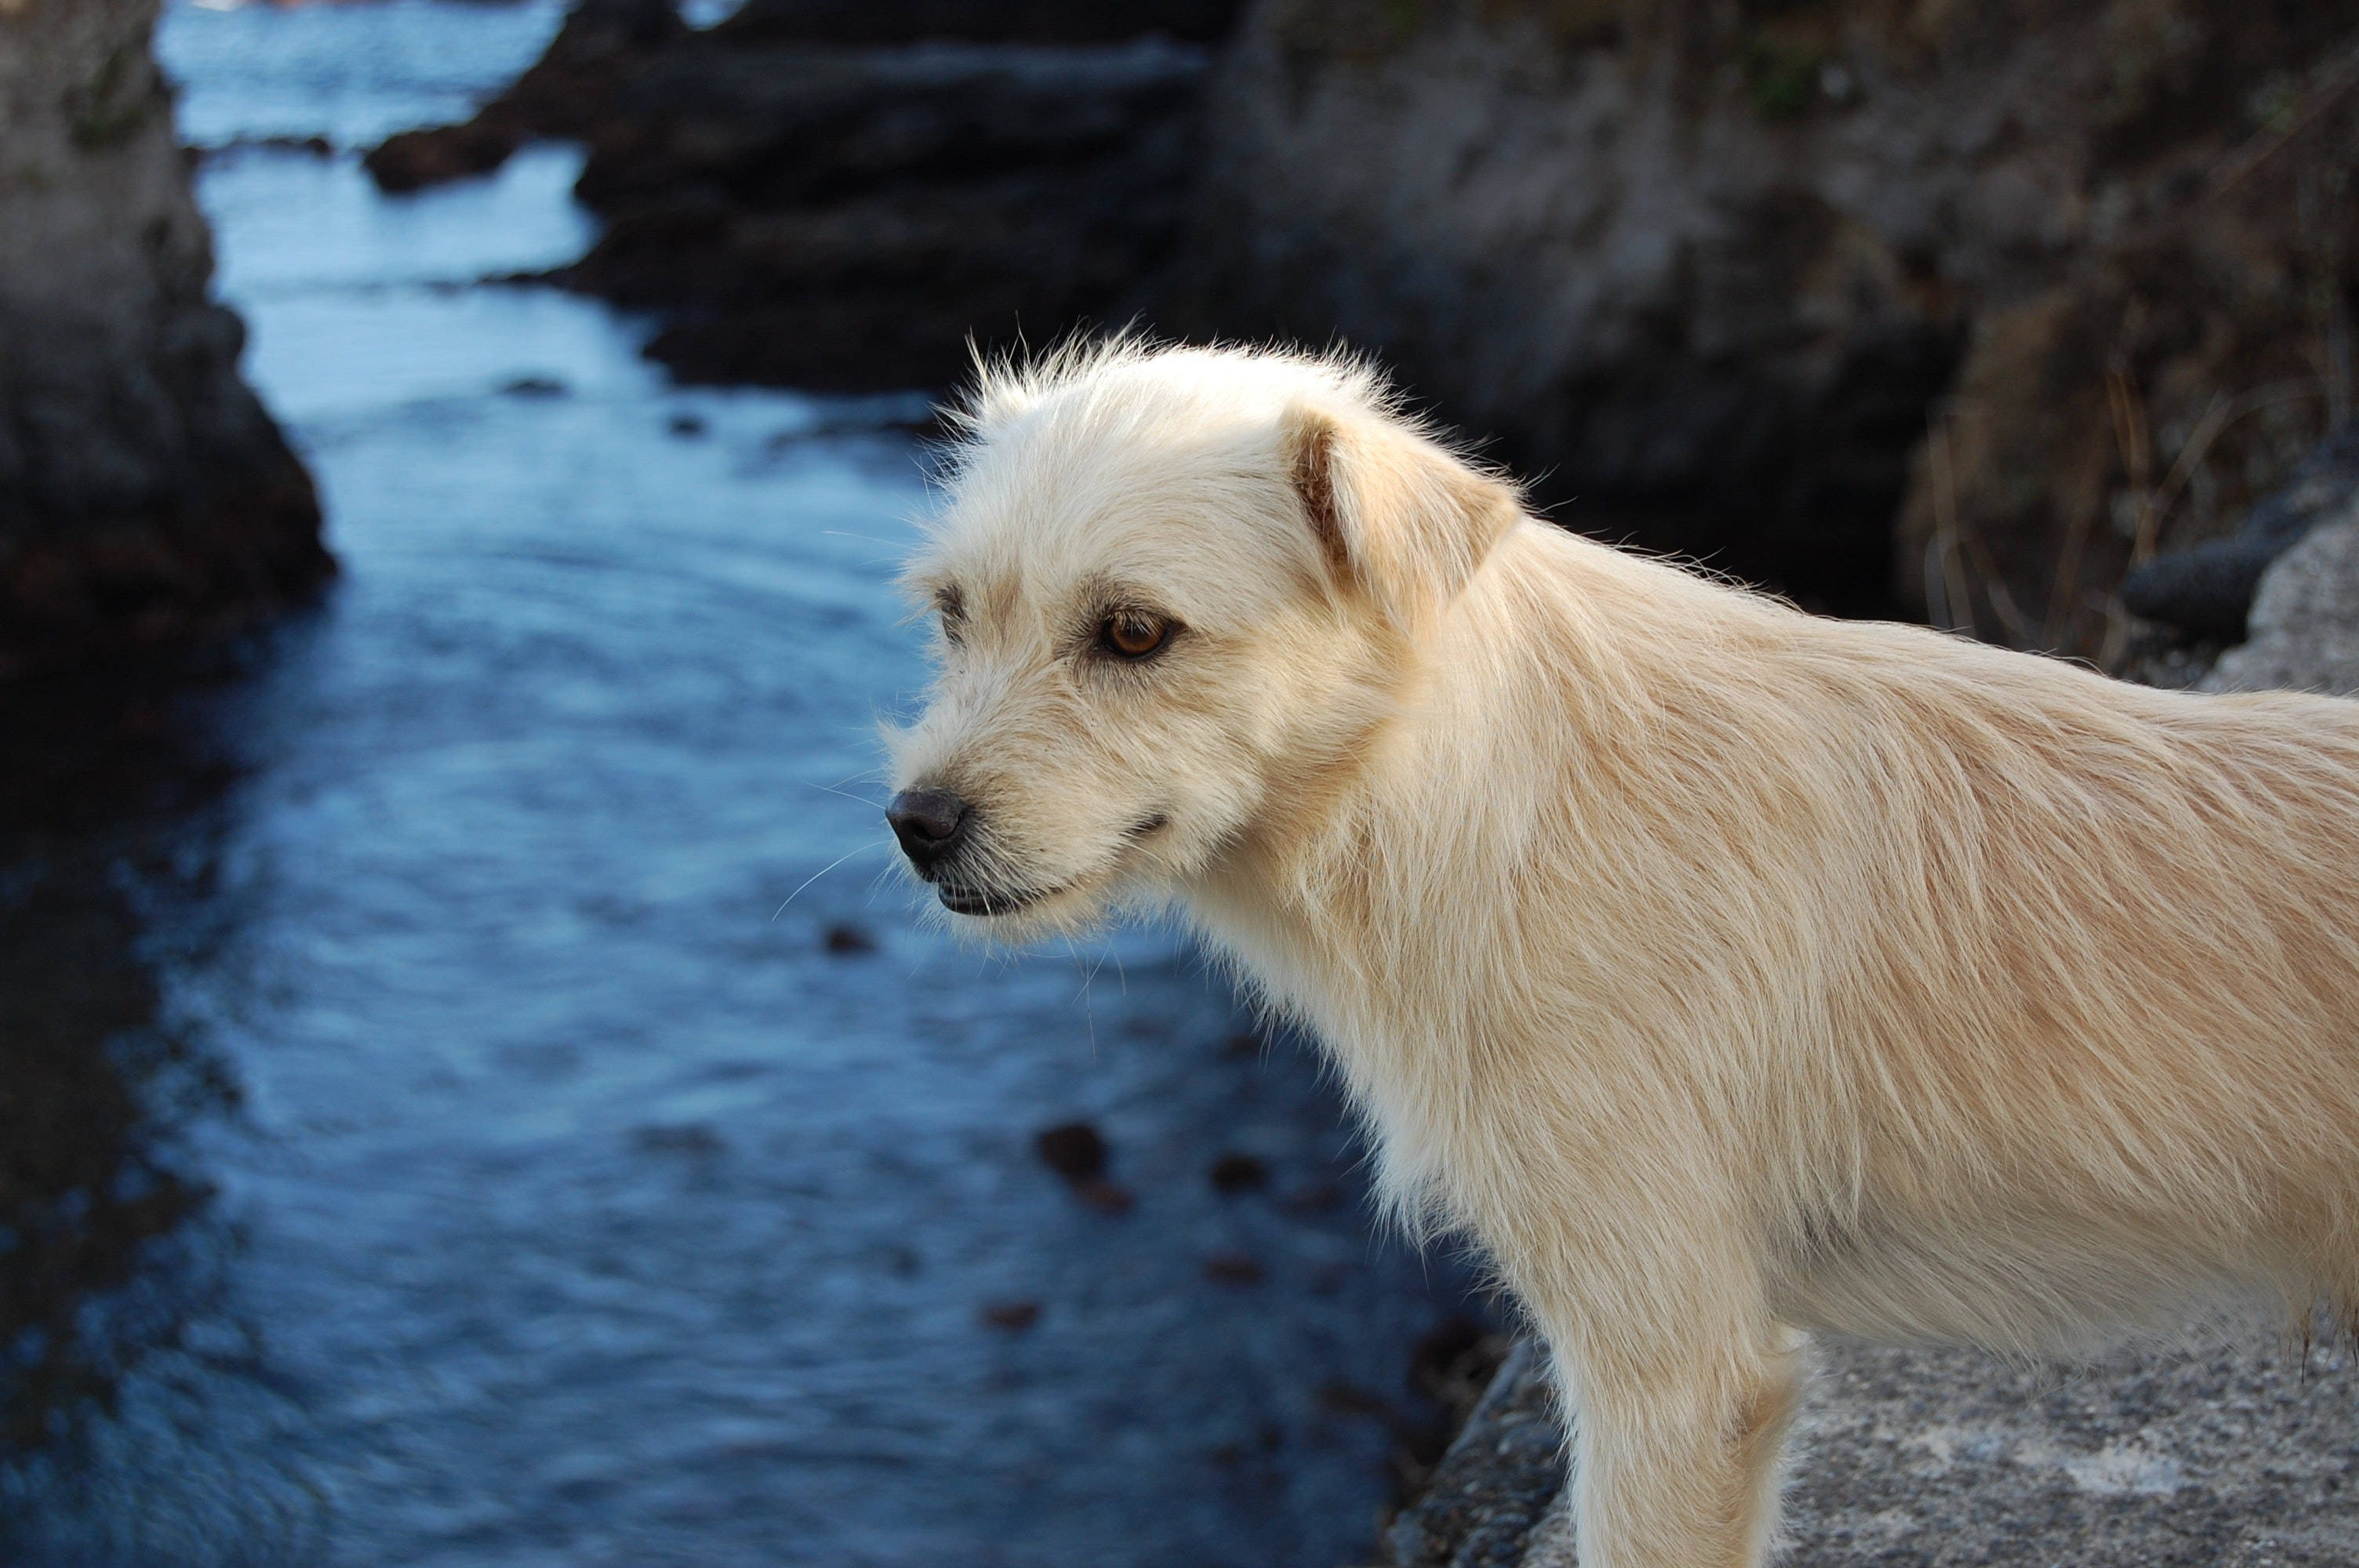 Close-up of wet dog by lake photo